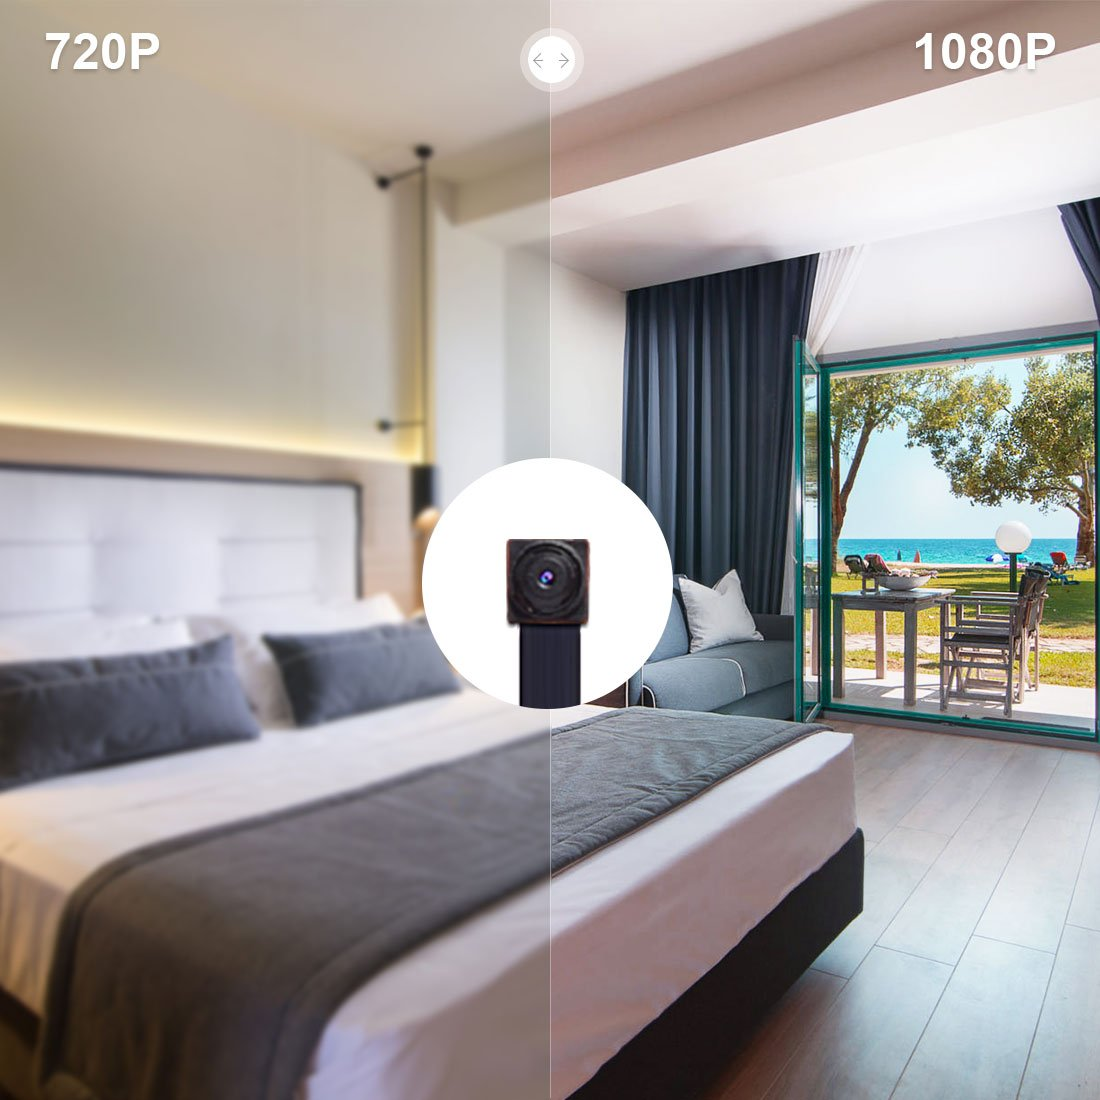 Mini Cámara Espía Boton AOBO 1080P HD Cámara Oculta WiFi Vigilancia Interior Cámara Portable Pequeña Casa Cámara Seguridad IP con Detectores de Movimiento ...